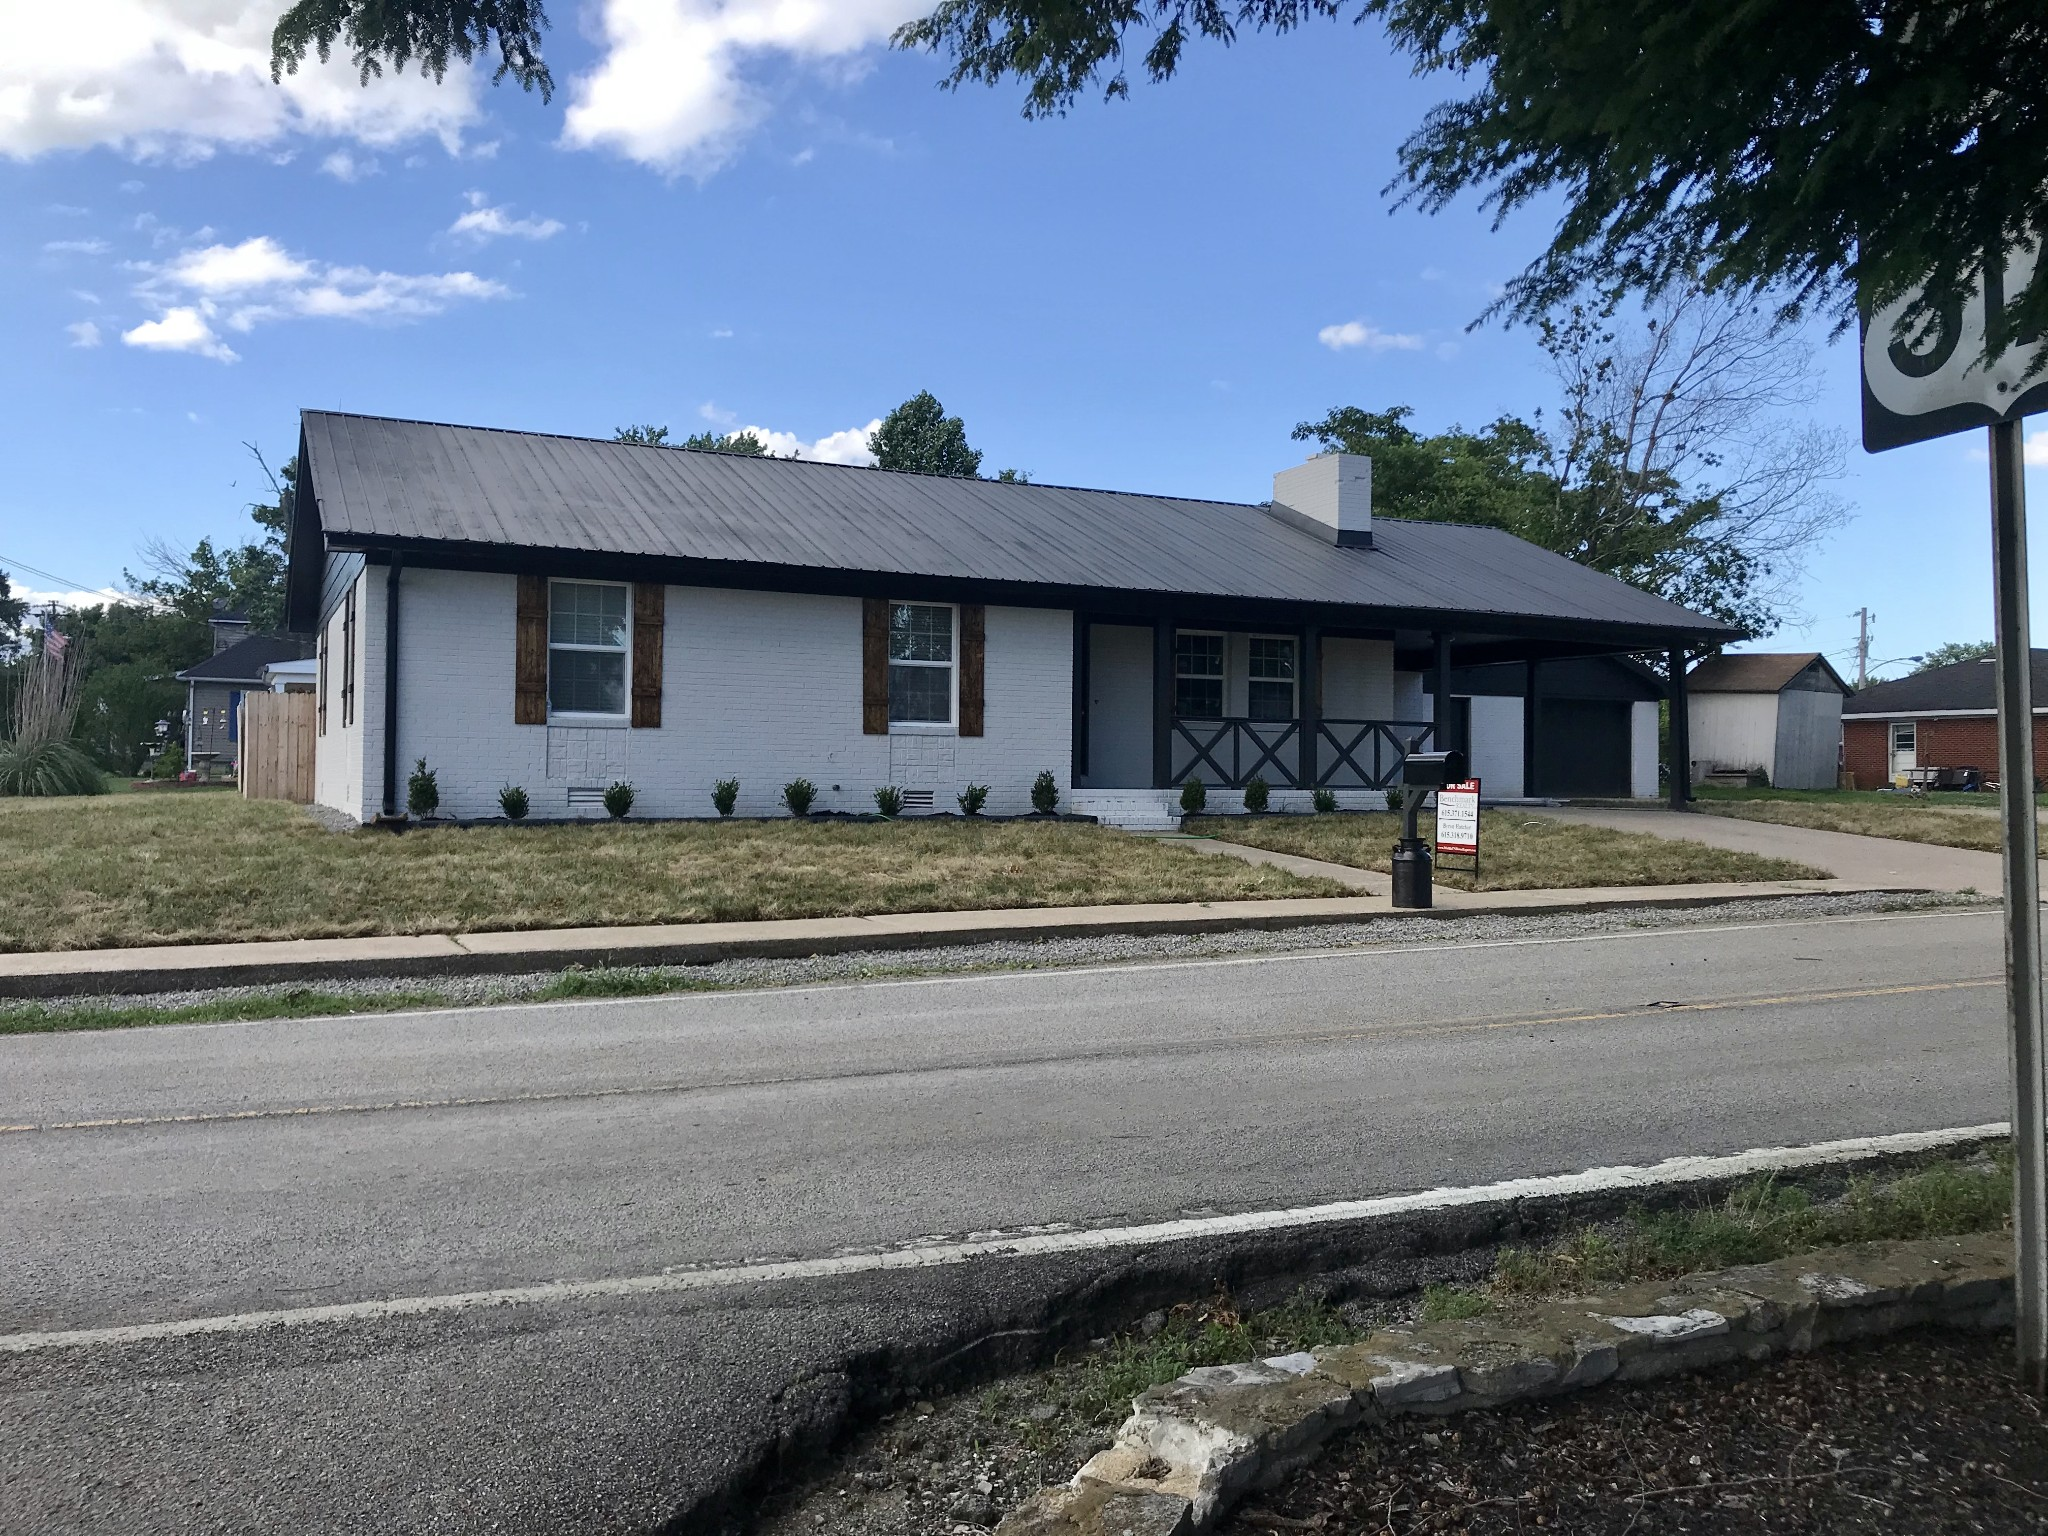 102 N Park Property Photo - Cornersville, TN real estate listing